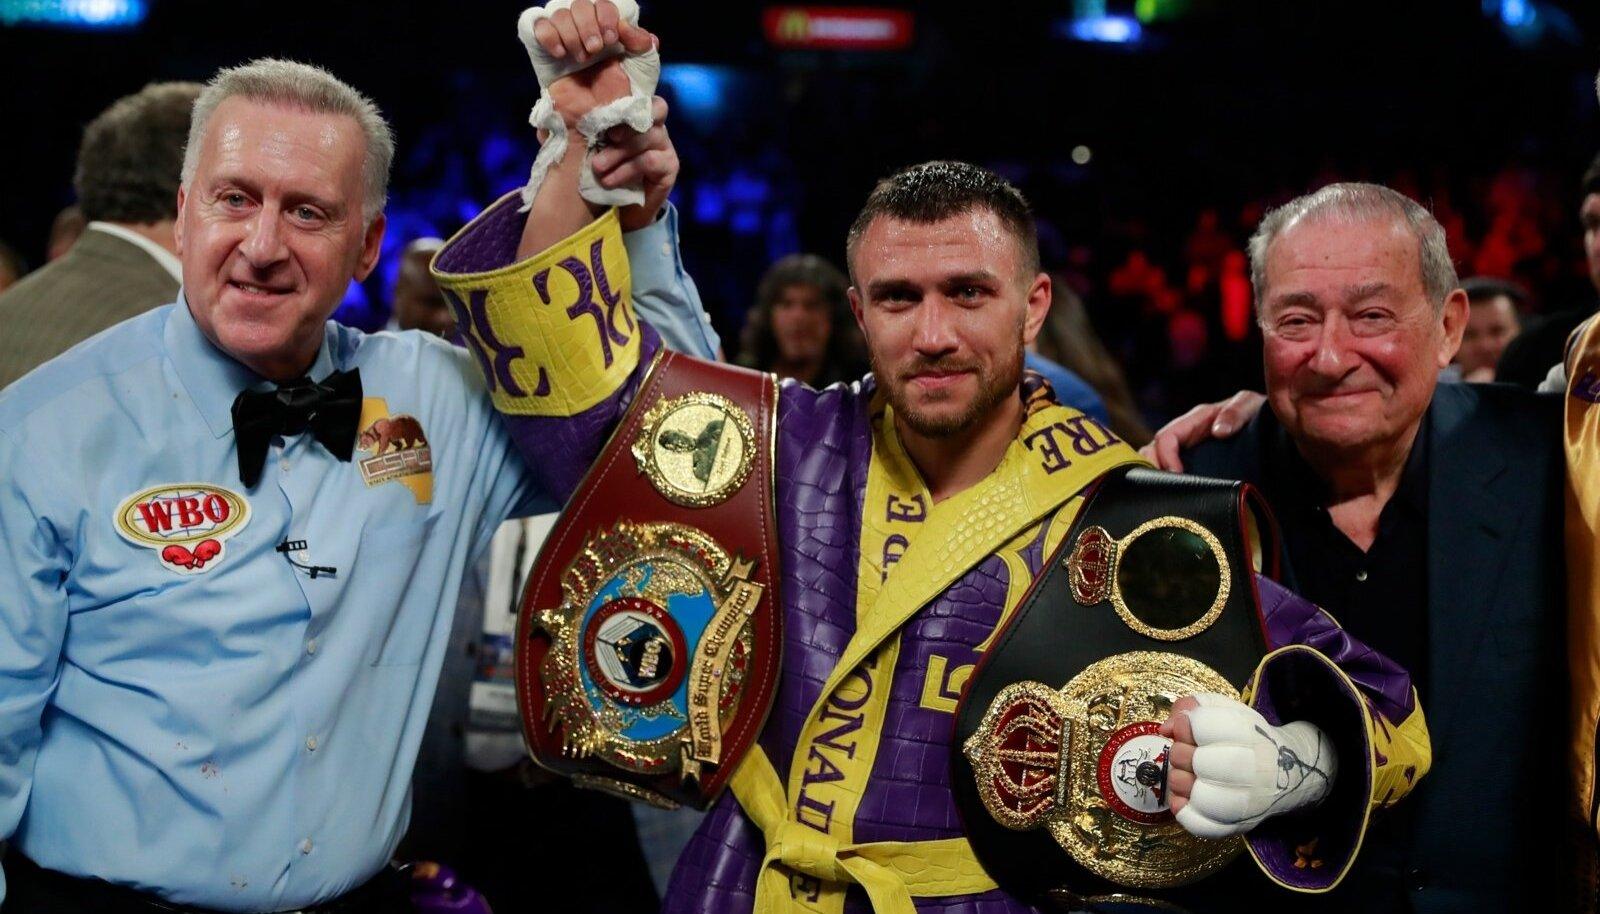 Boxing - Vasyl Lomachenko v Anthony Crolla - WBA & WBO World Lightweight Titles